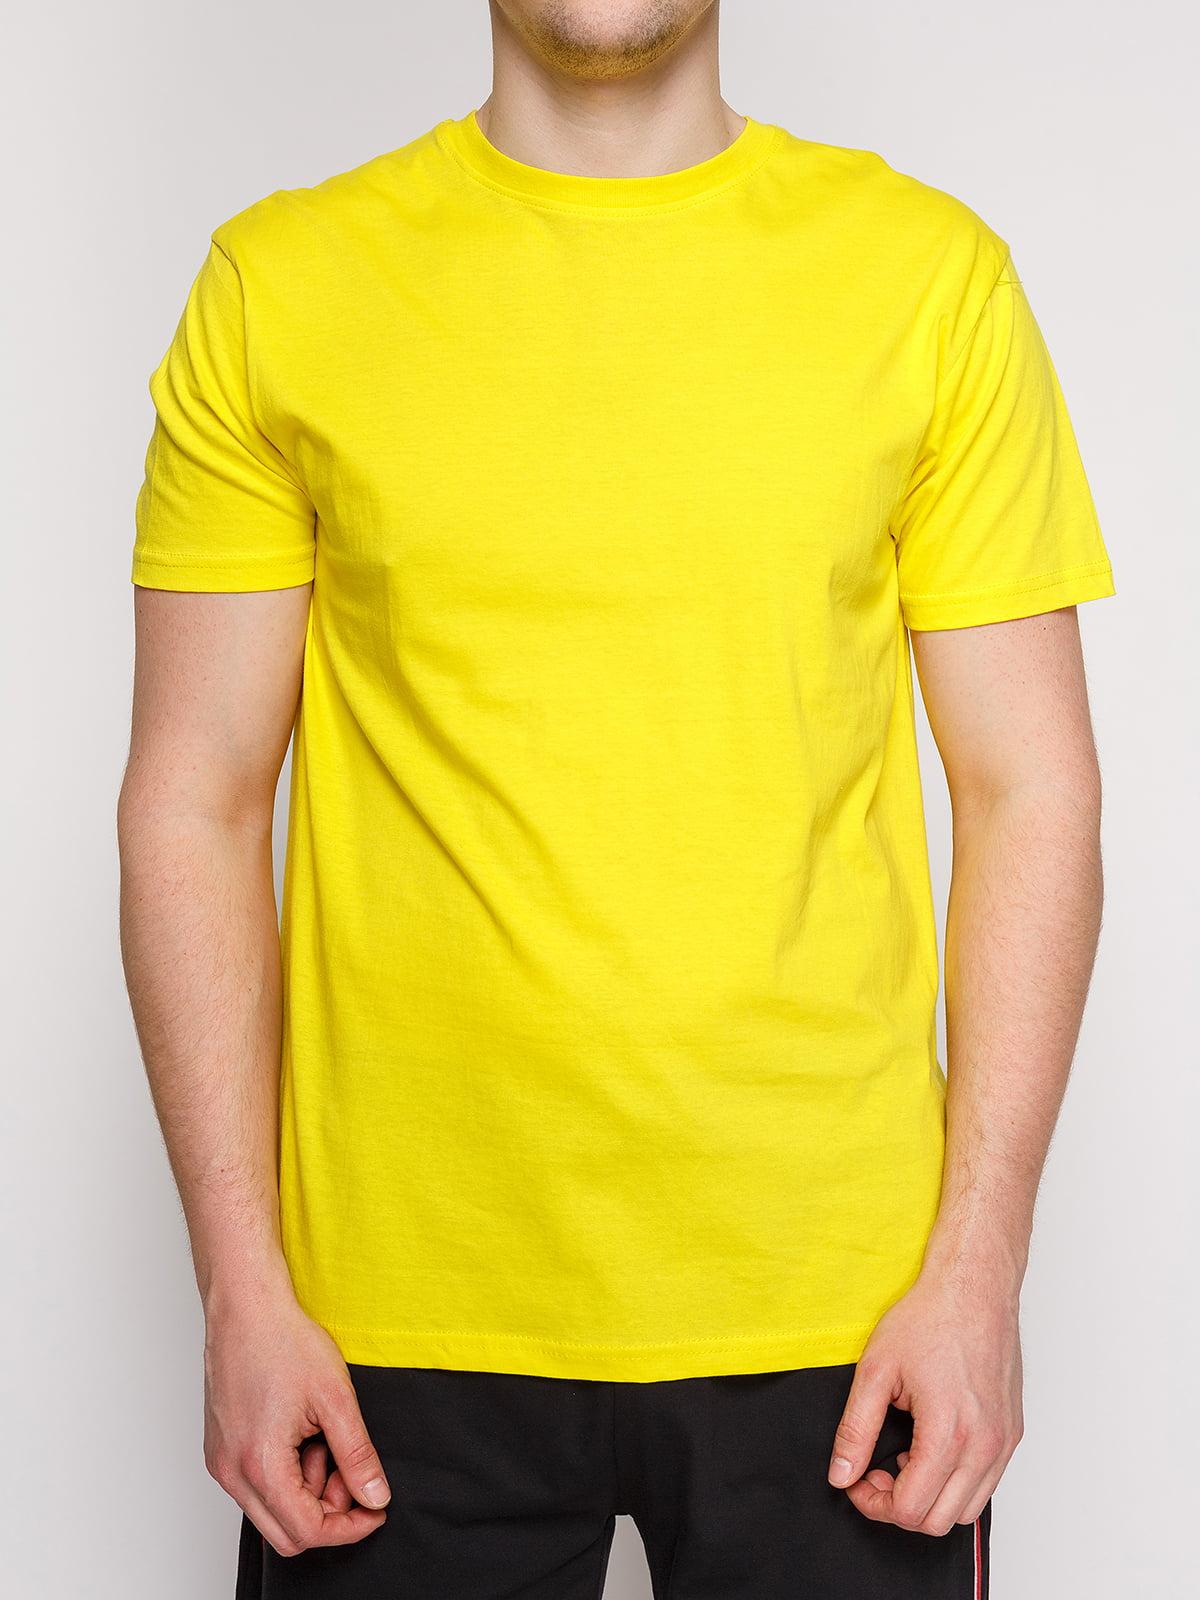 Футболка жовта | 4854909 | фото 3